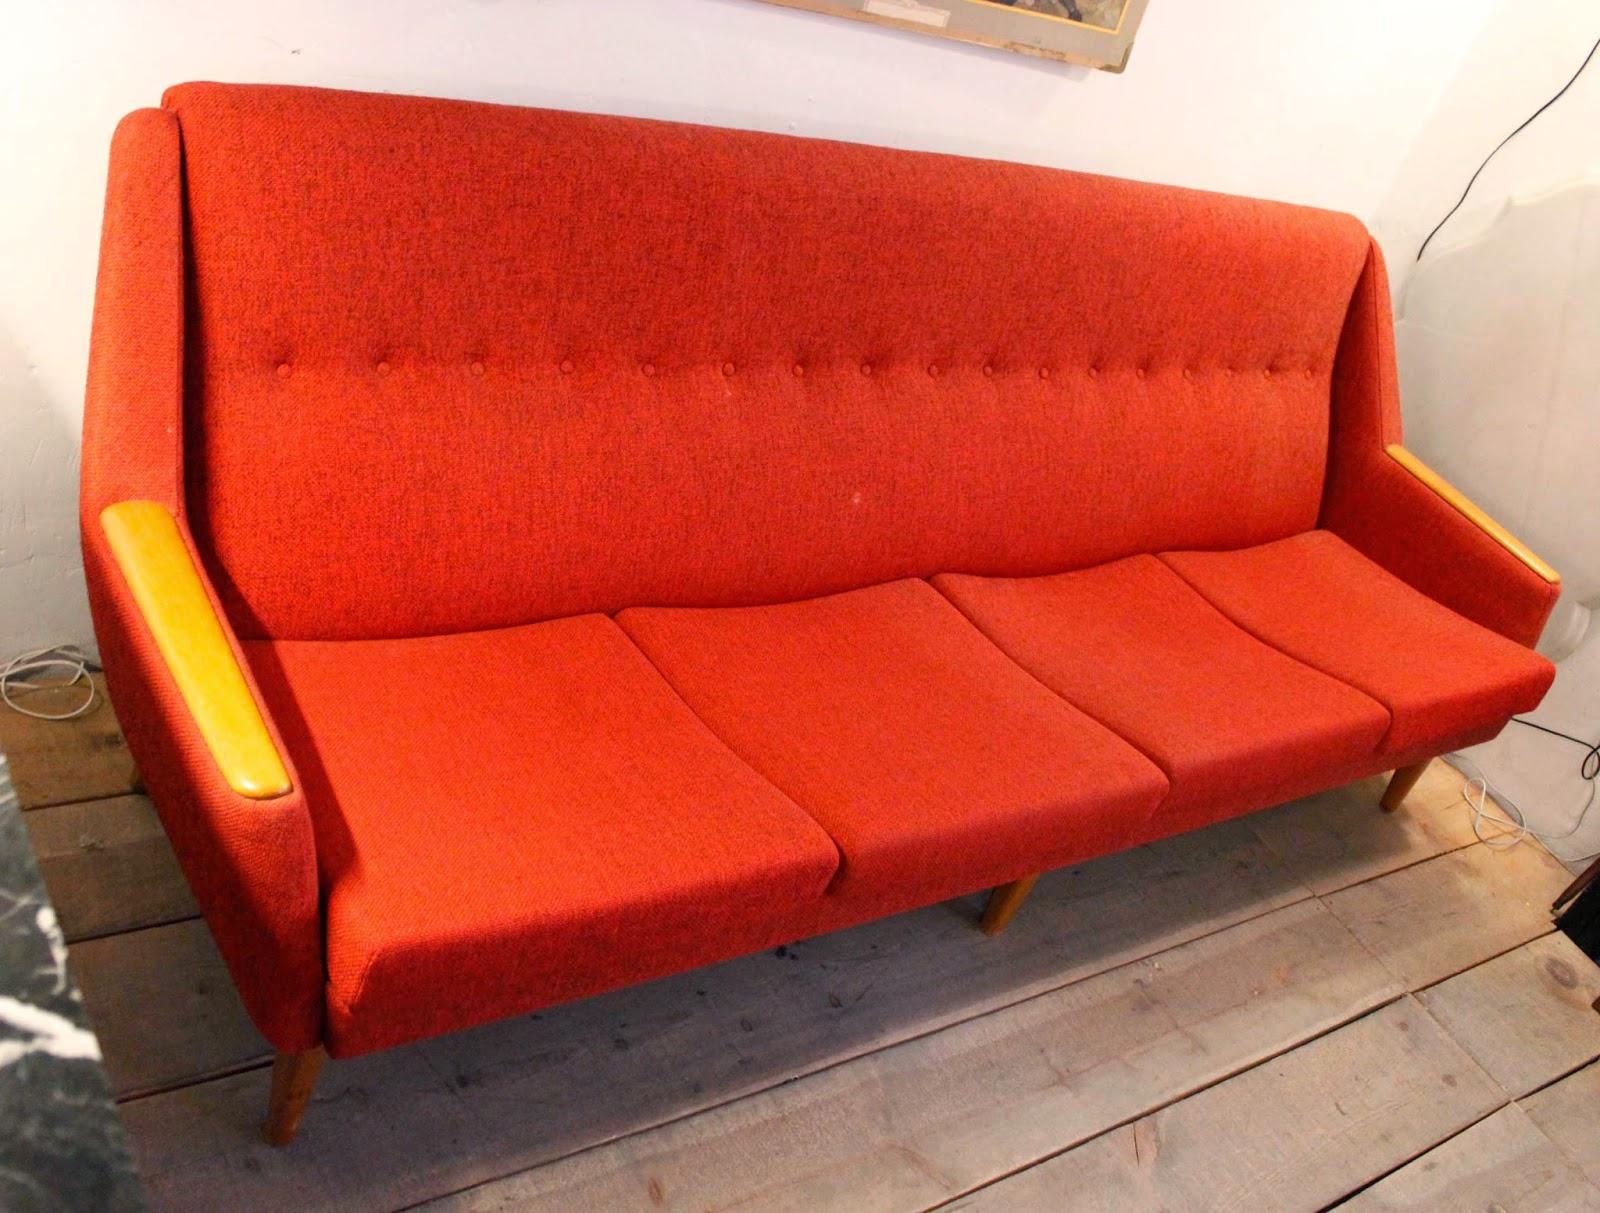 Comprar Sofa Madrid Chaise Longue With Comprar Sofa Madrid  # Muebles Portazgo